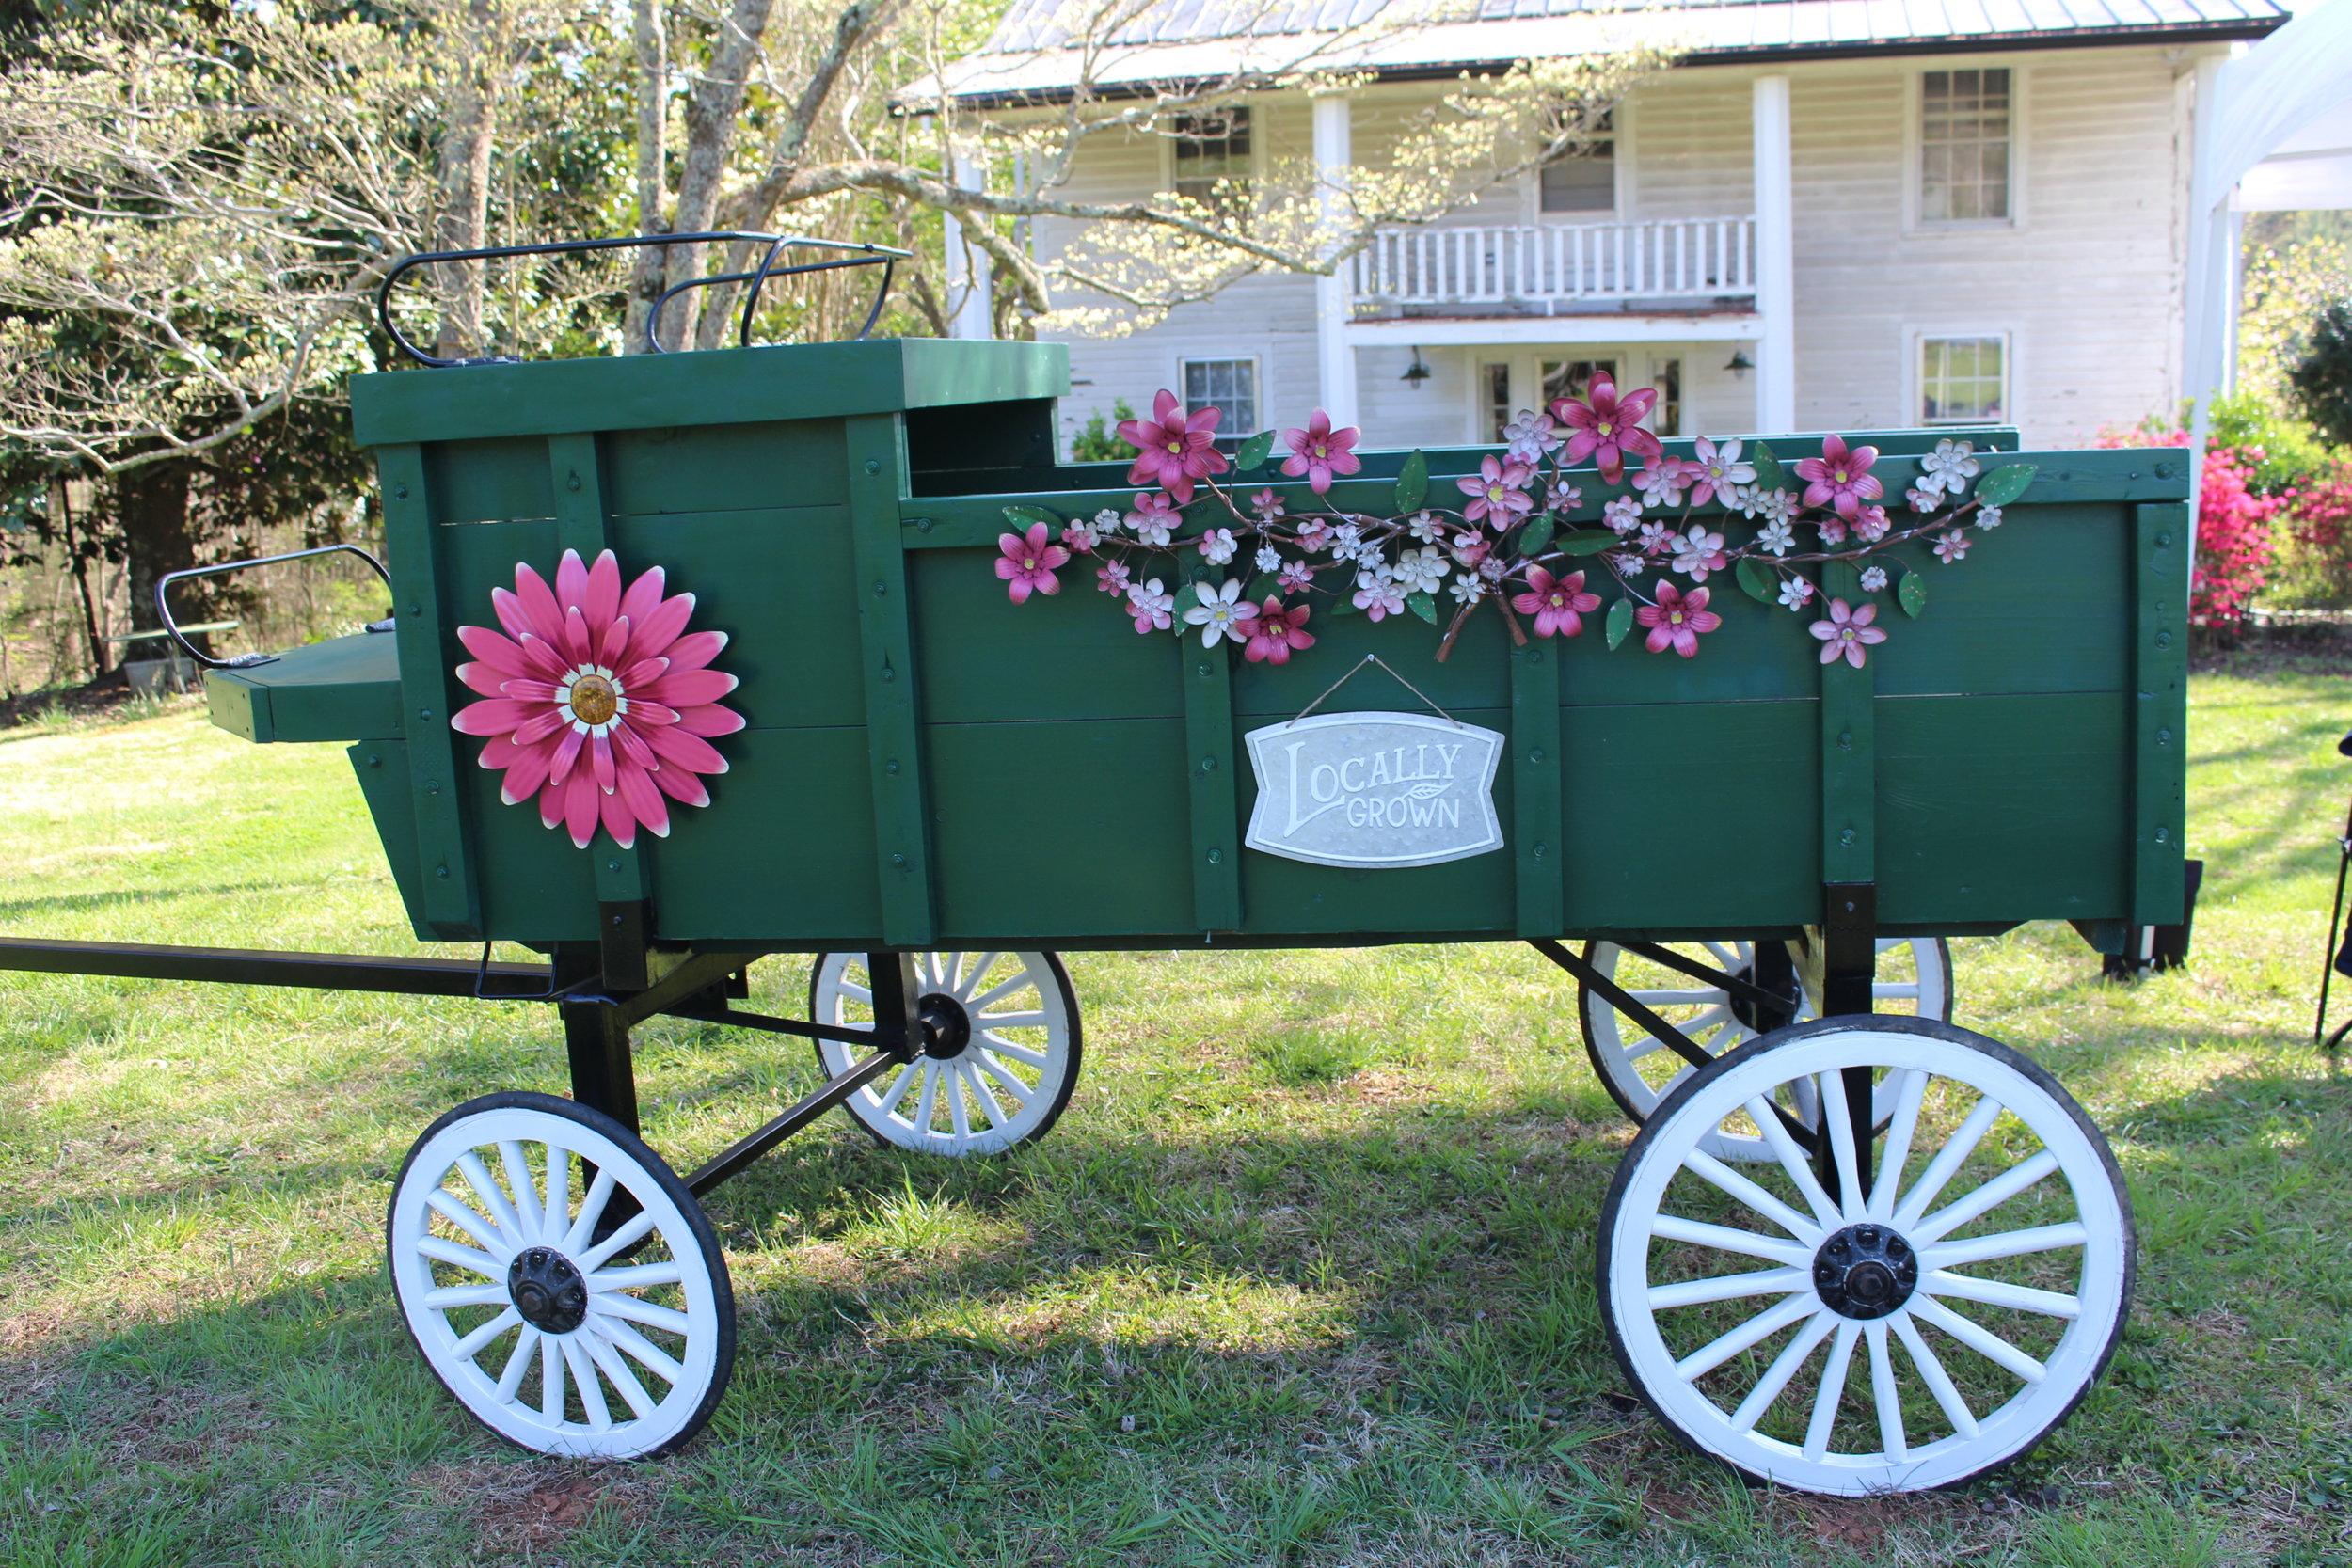 STILL WATERS FARM AND GARDENS Flower Wagon